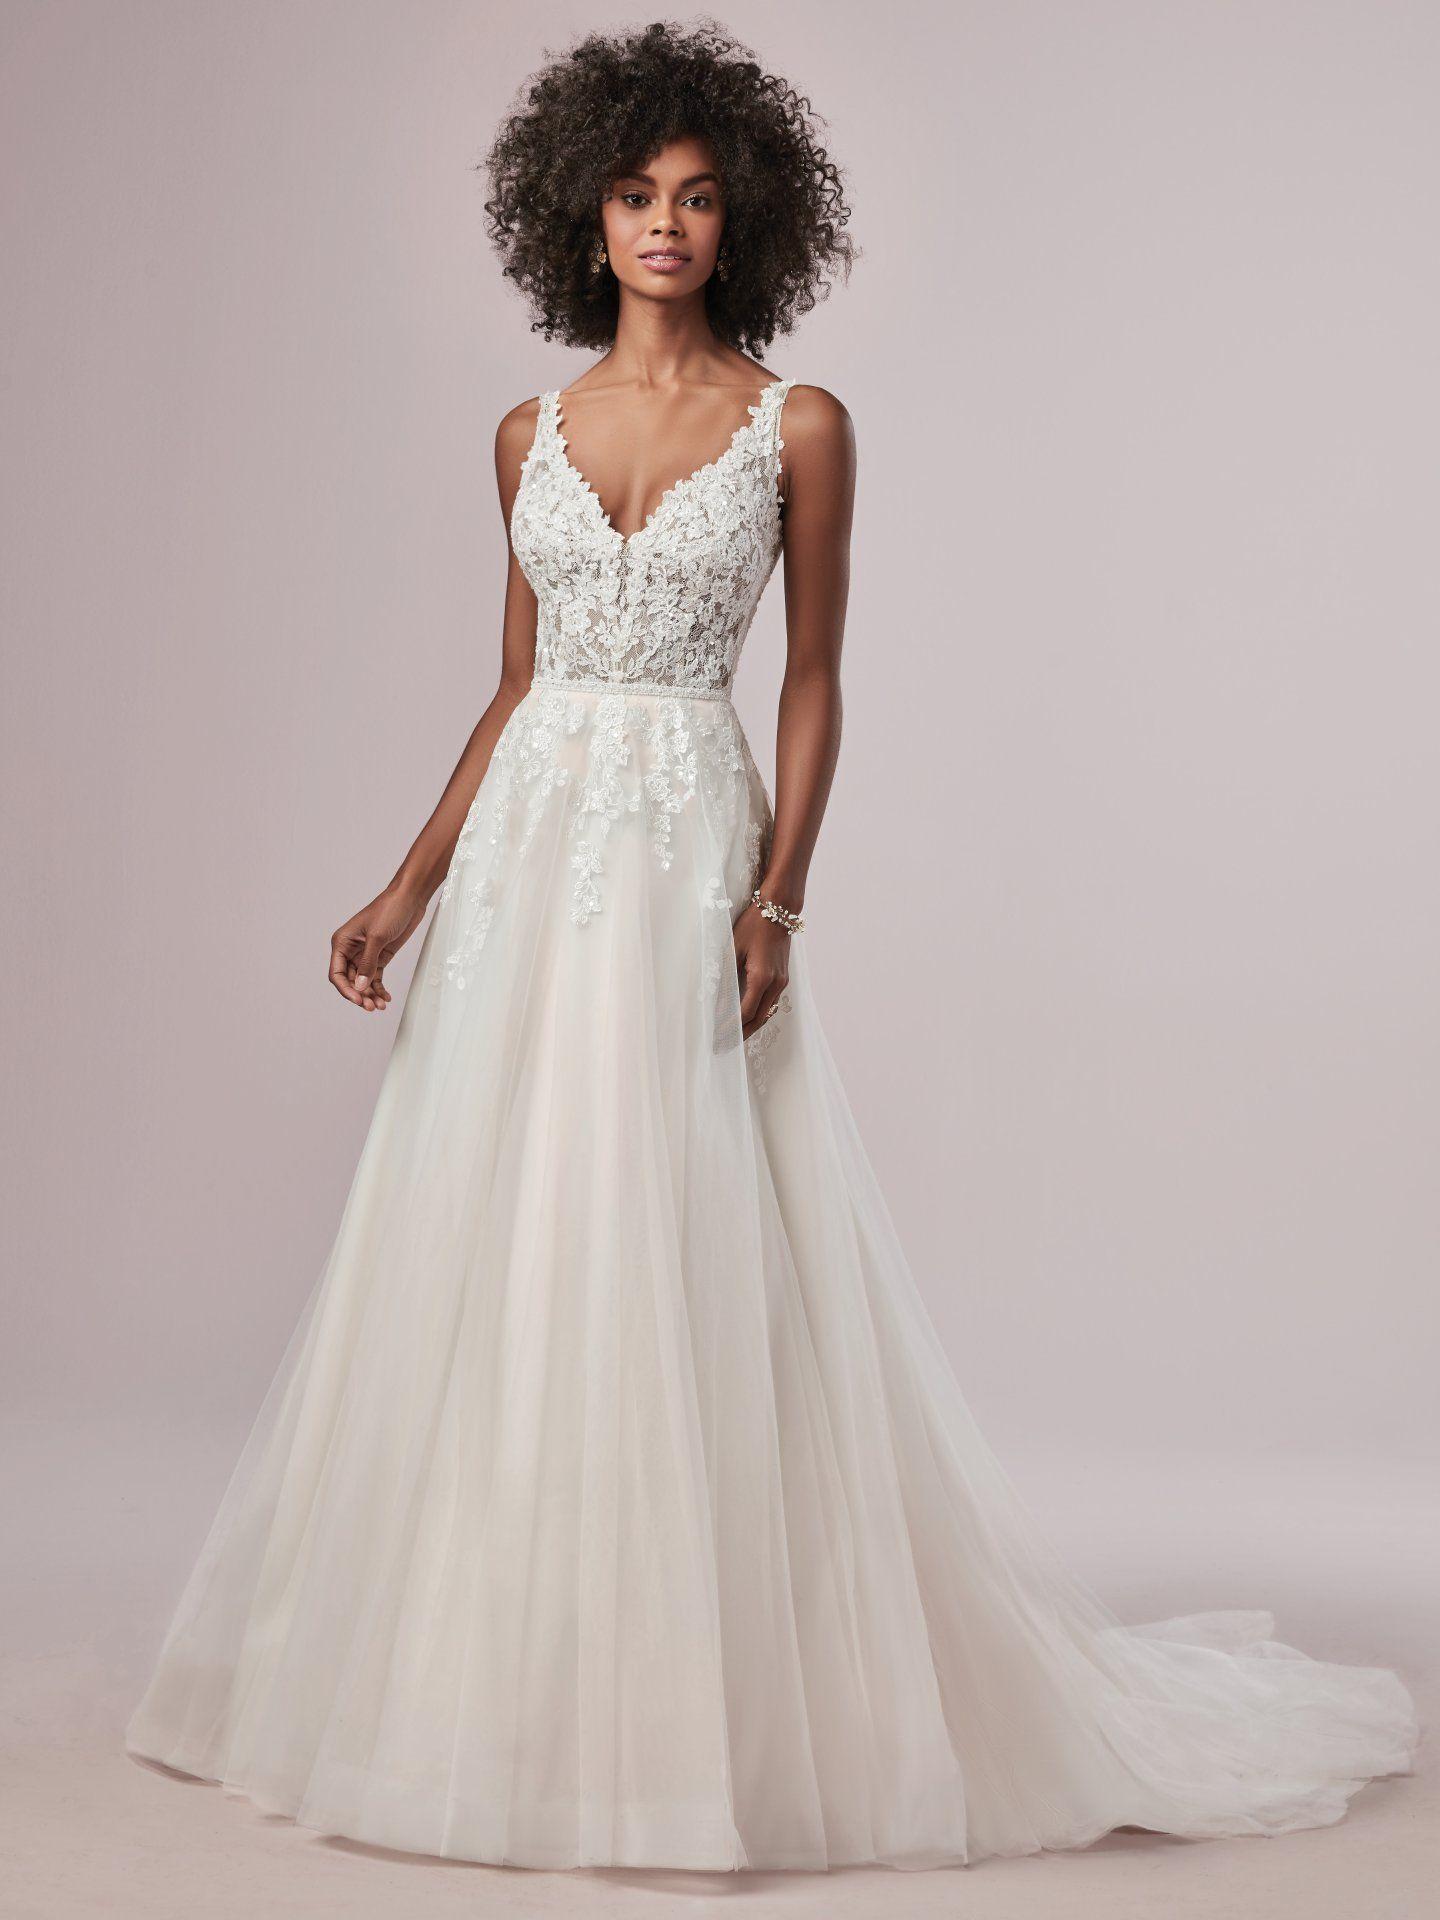 Miriam rose by rebecca ingram wedding dresses in 2020 a